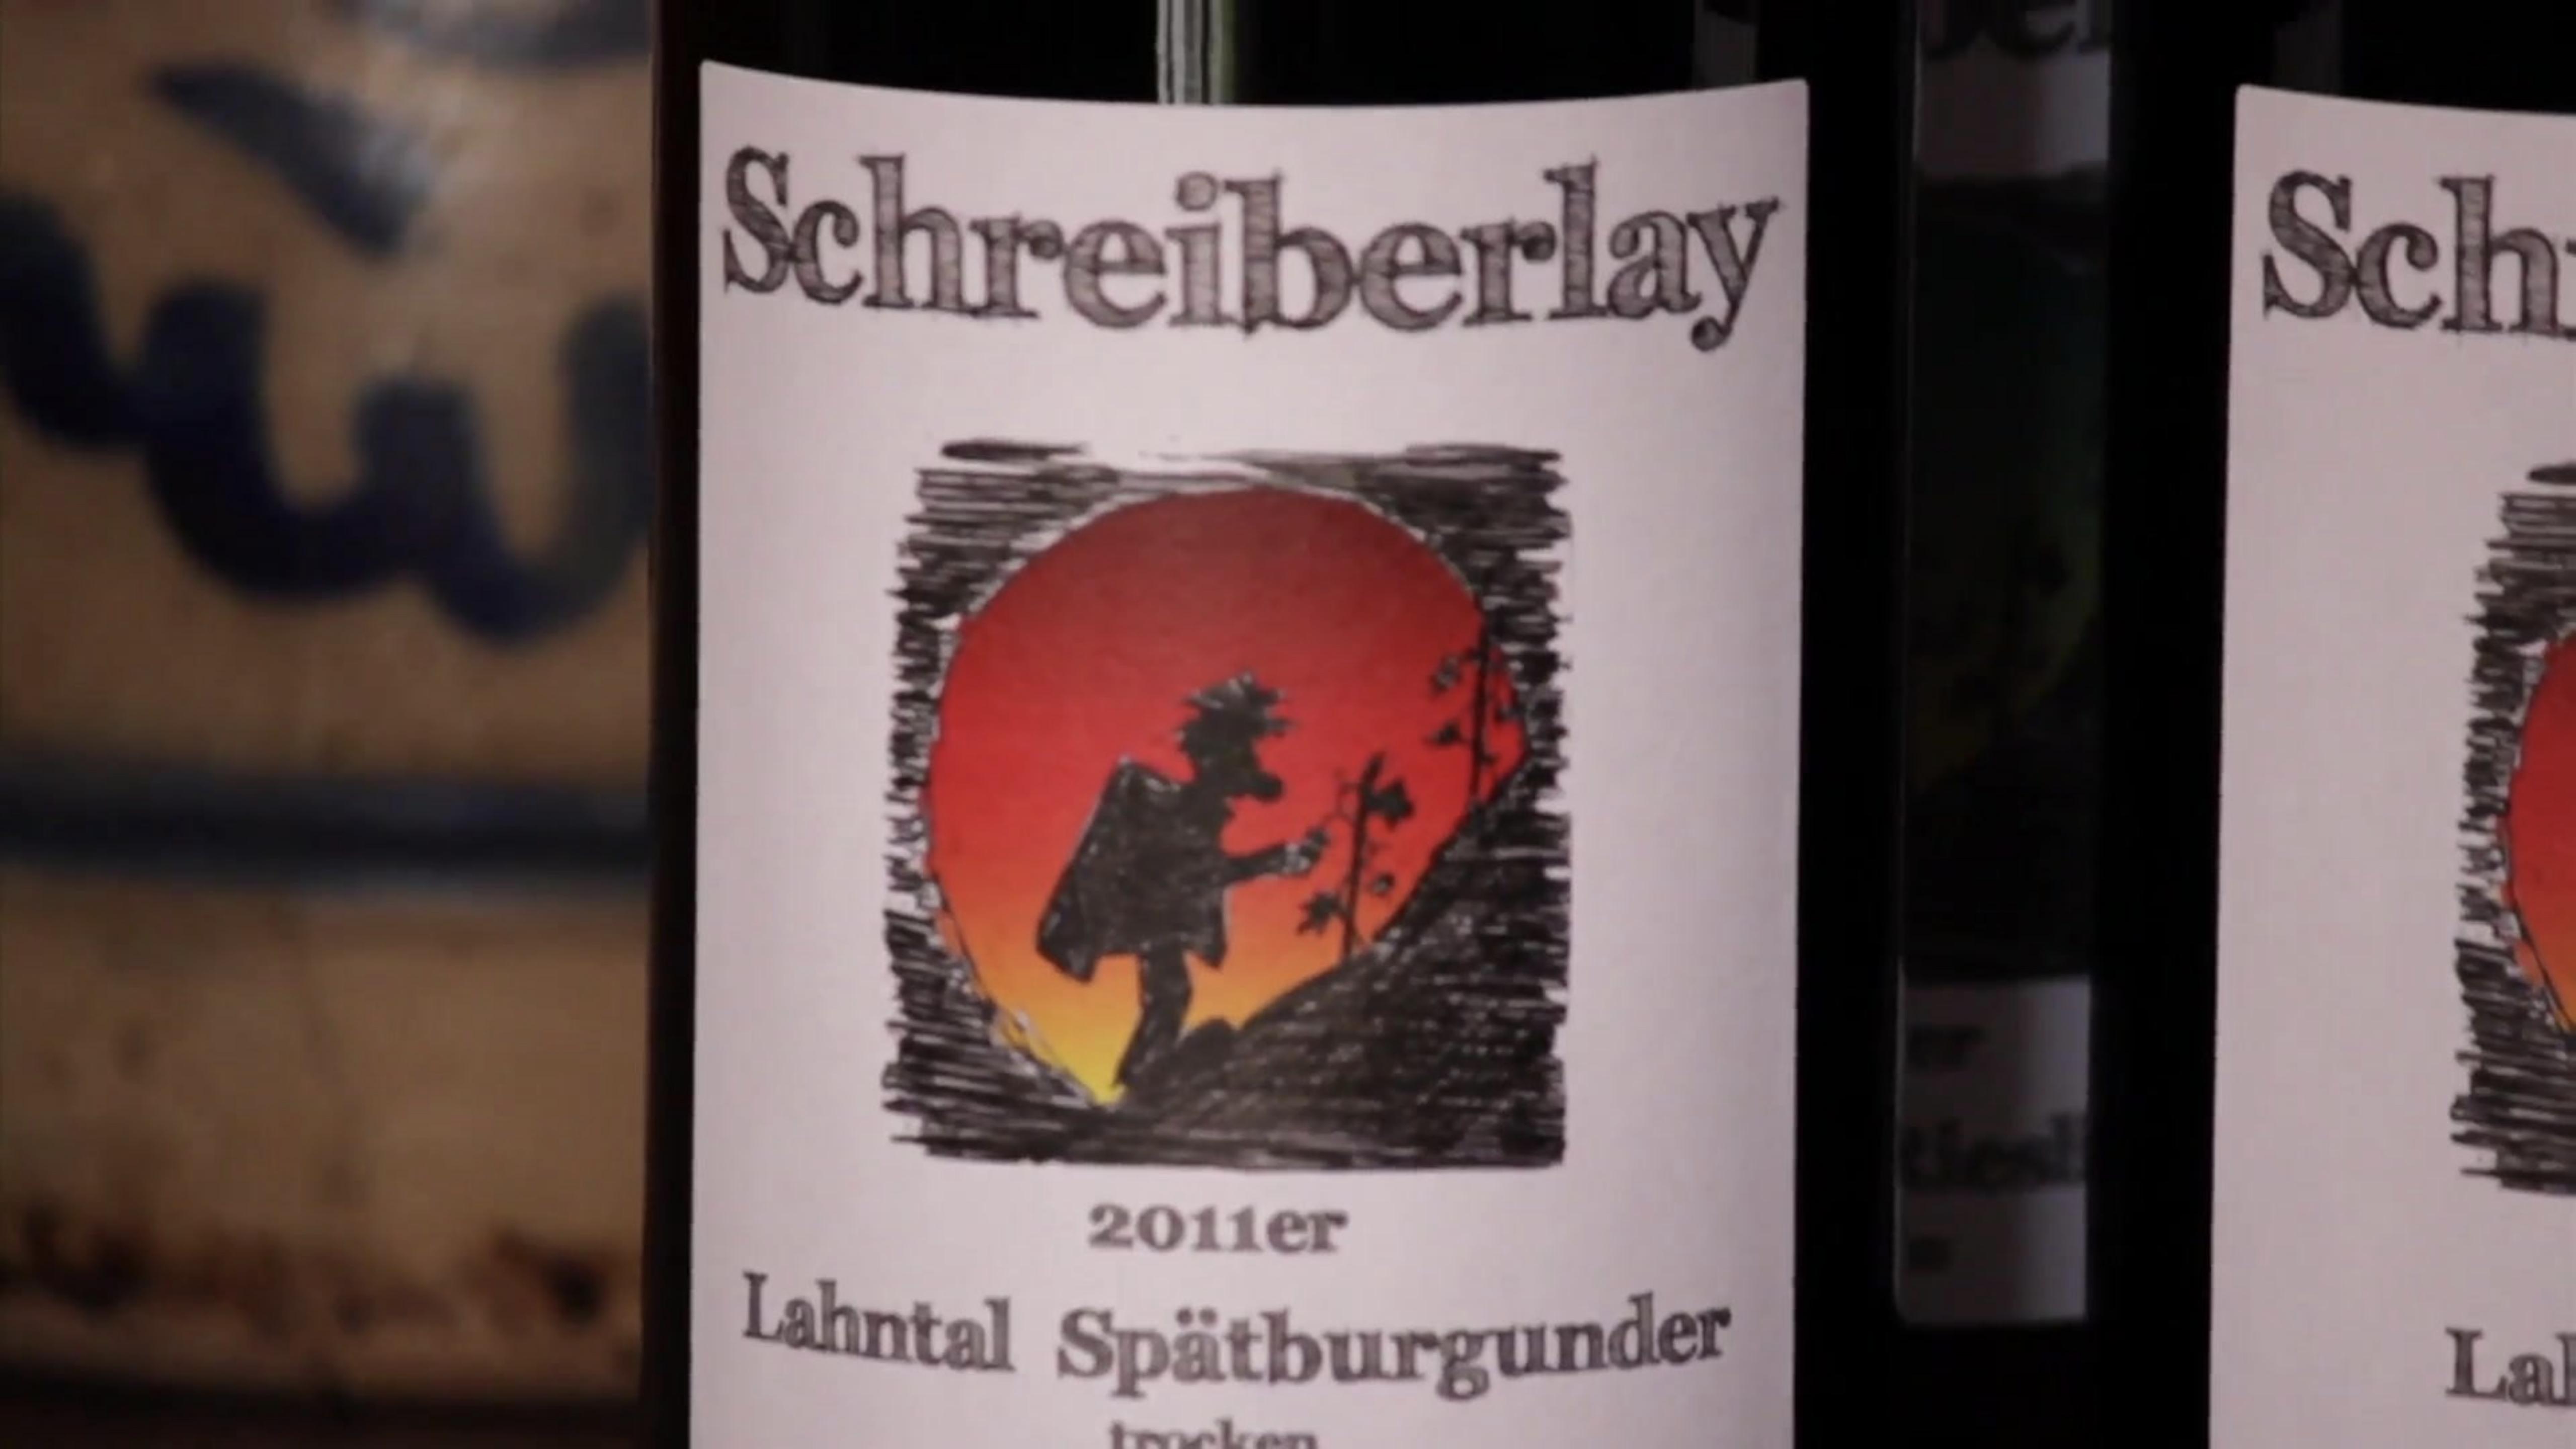 Winery Schreiberlay